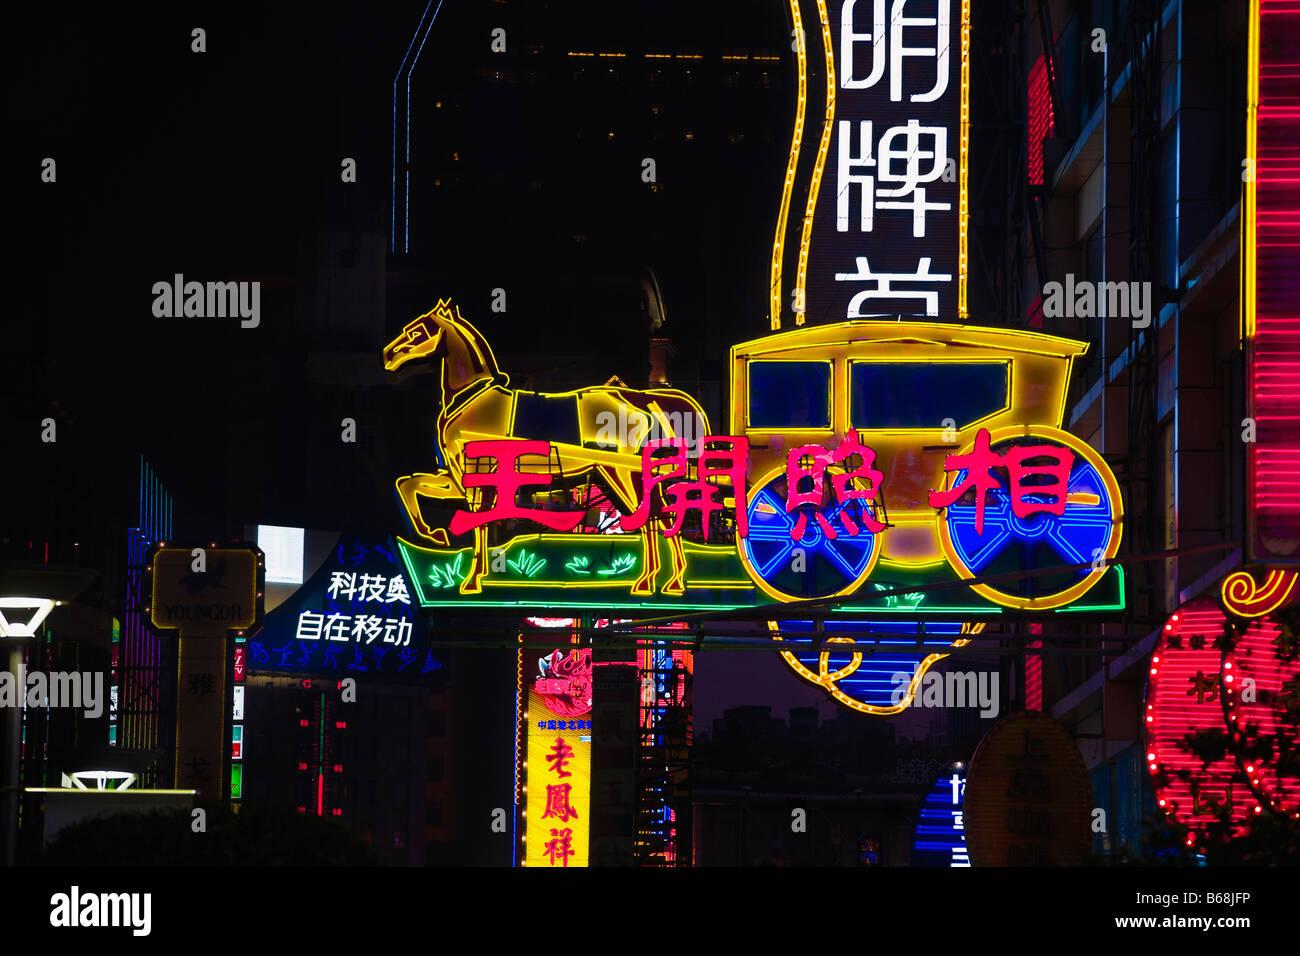 Avisos Comerciales iluminados durante la noche, la Calle Nanjing, Shanghai, China Foto de stock